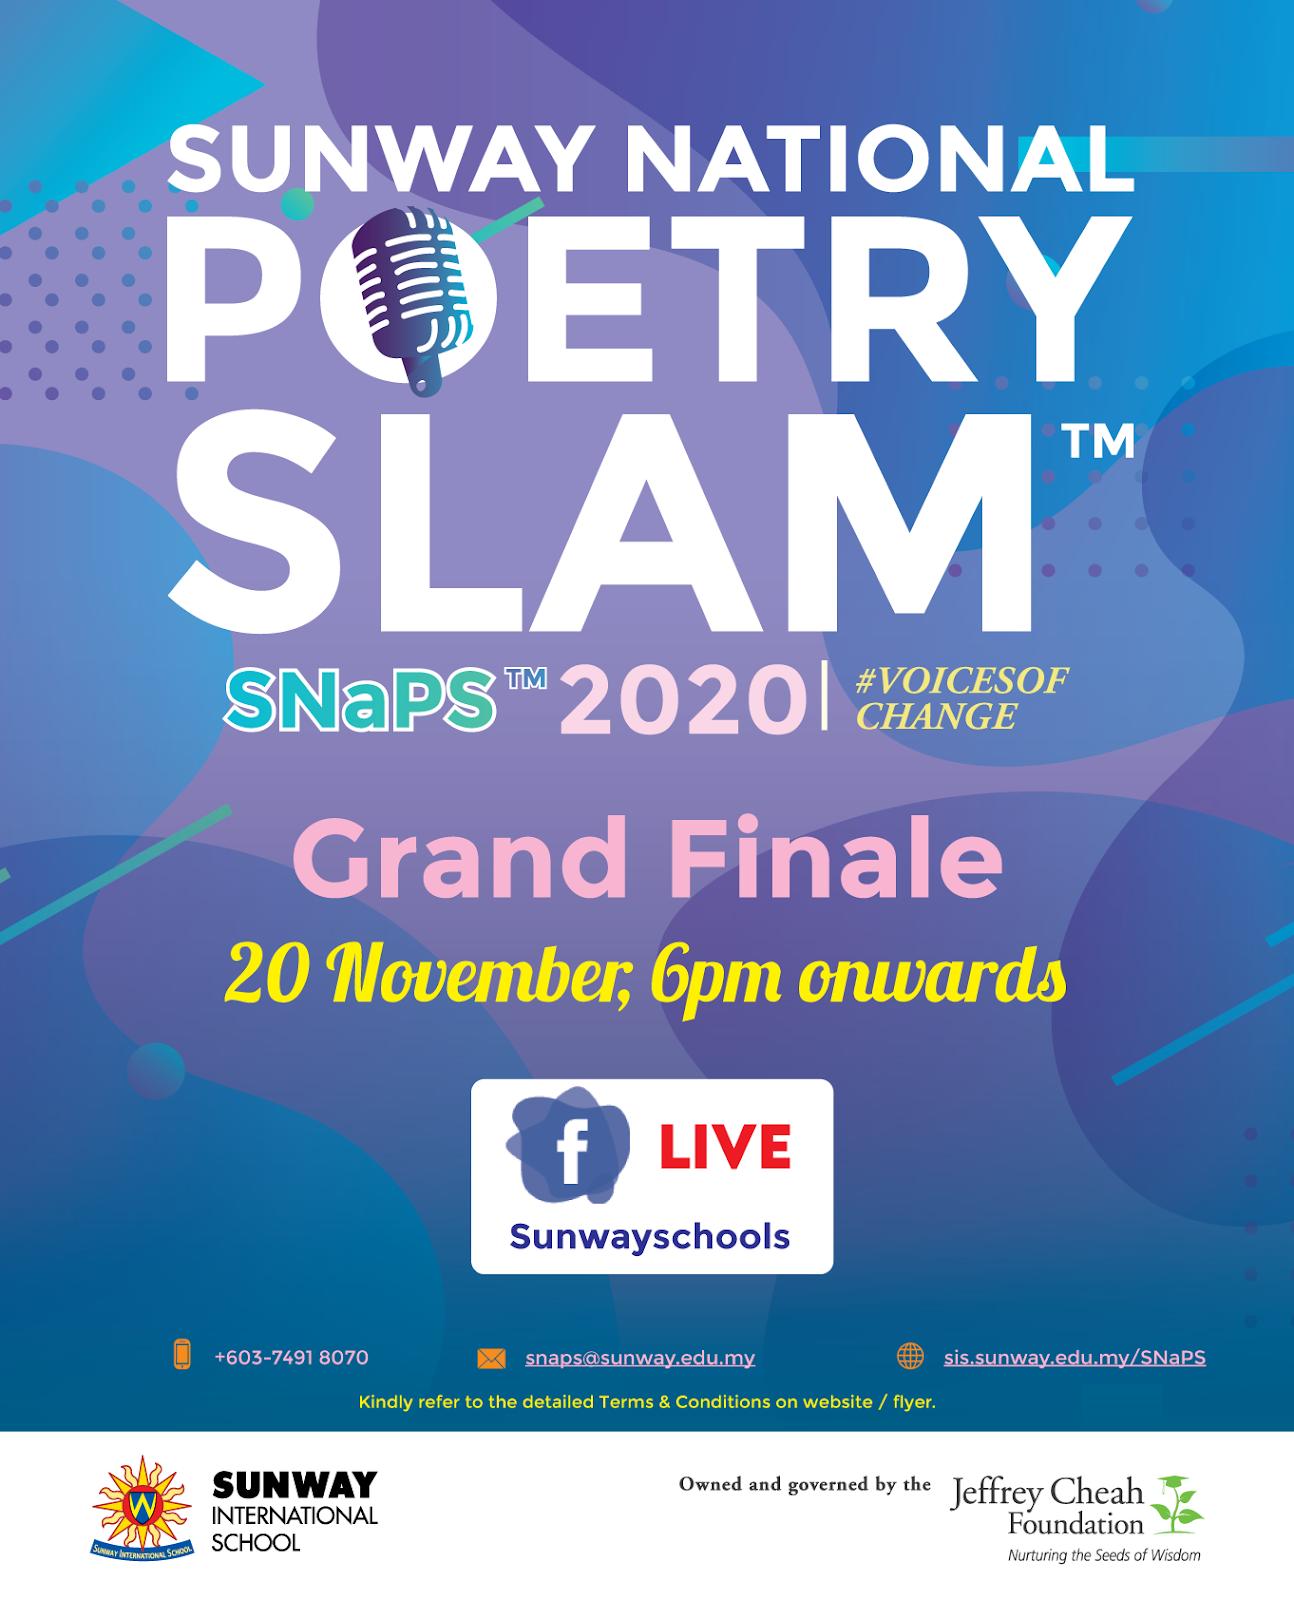 Sunway National Poetry Slam Success